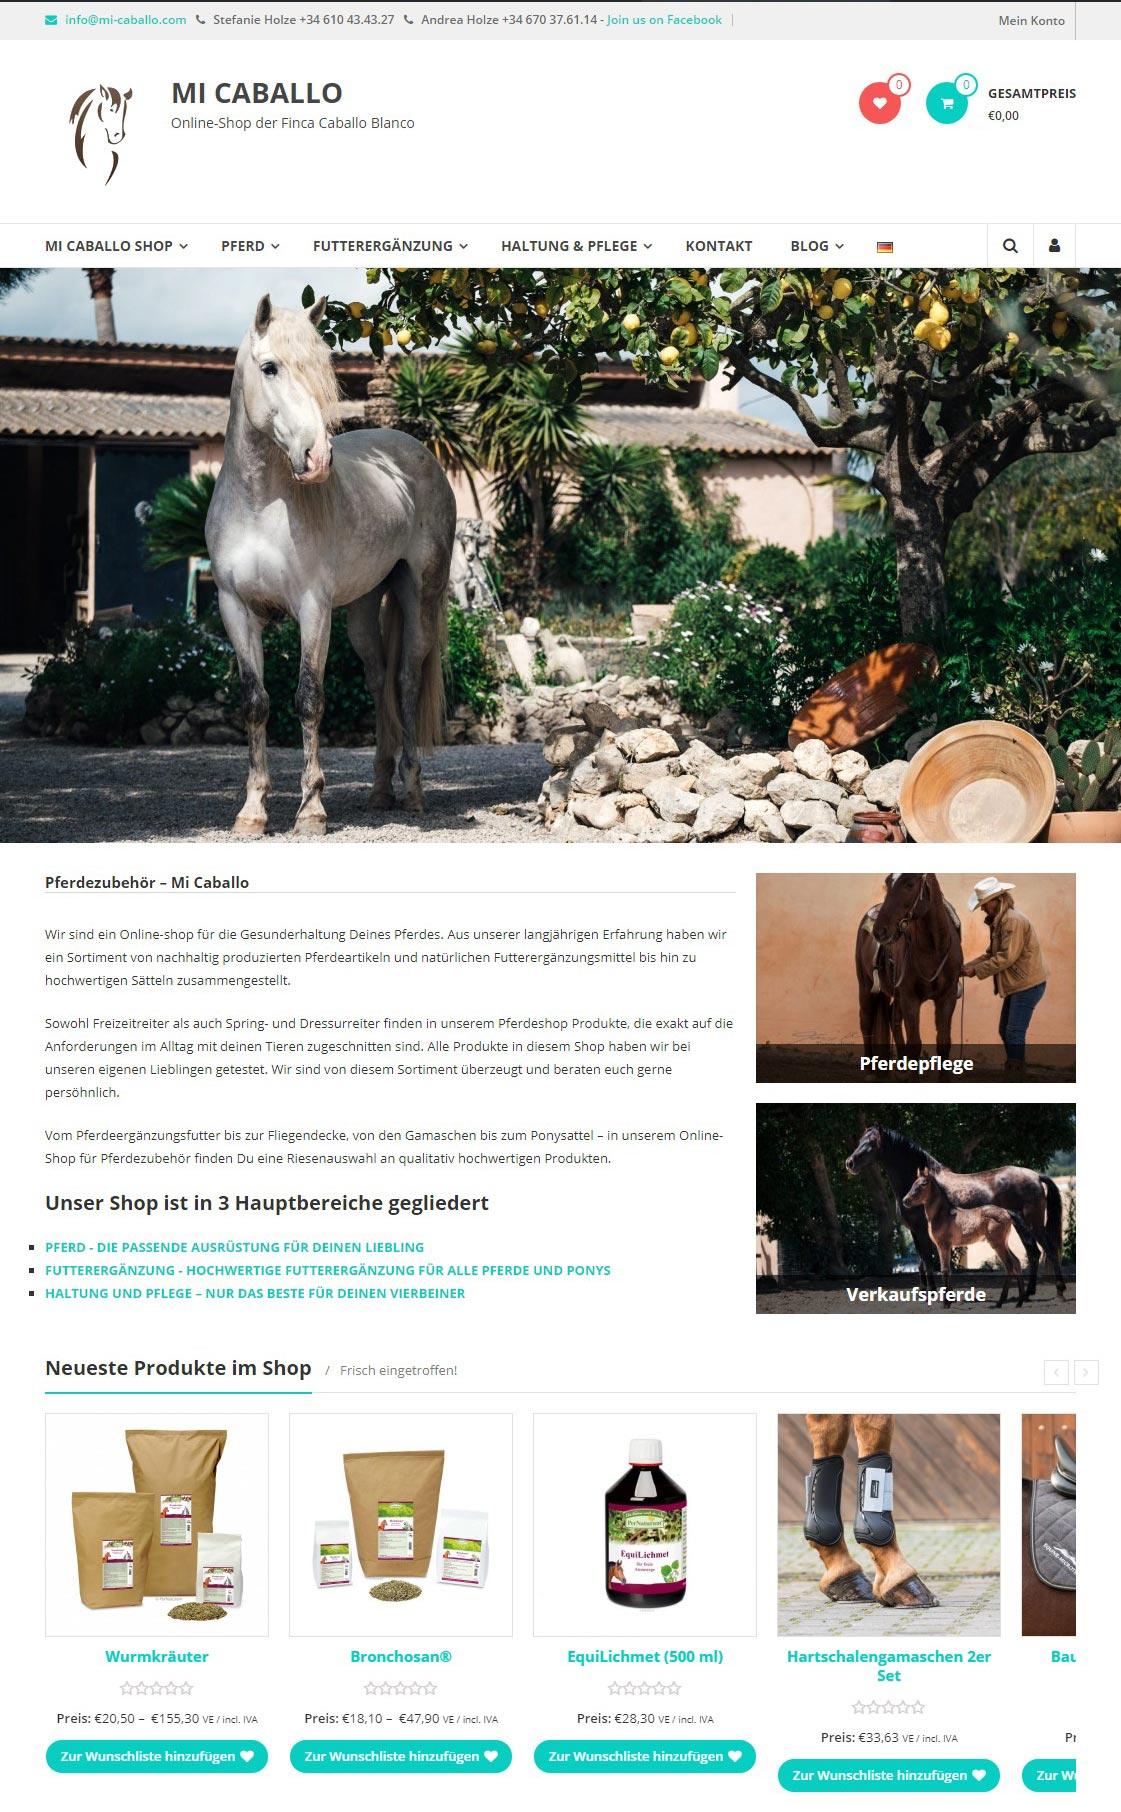 Mi-Caballo.com<br />Entwicklung der CI, Grafik & Layout für Online<br />www.mi-caballo.com